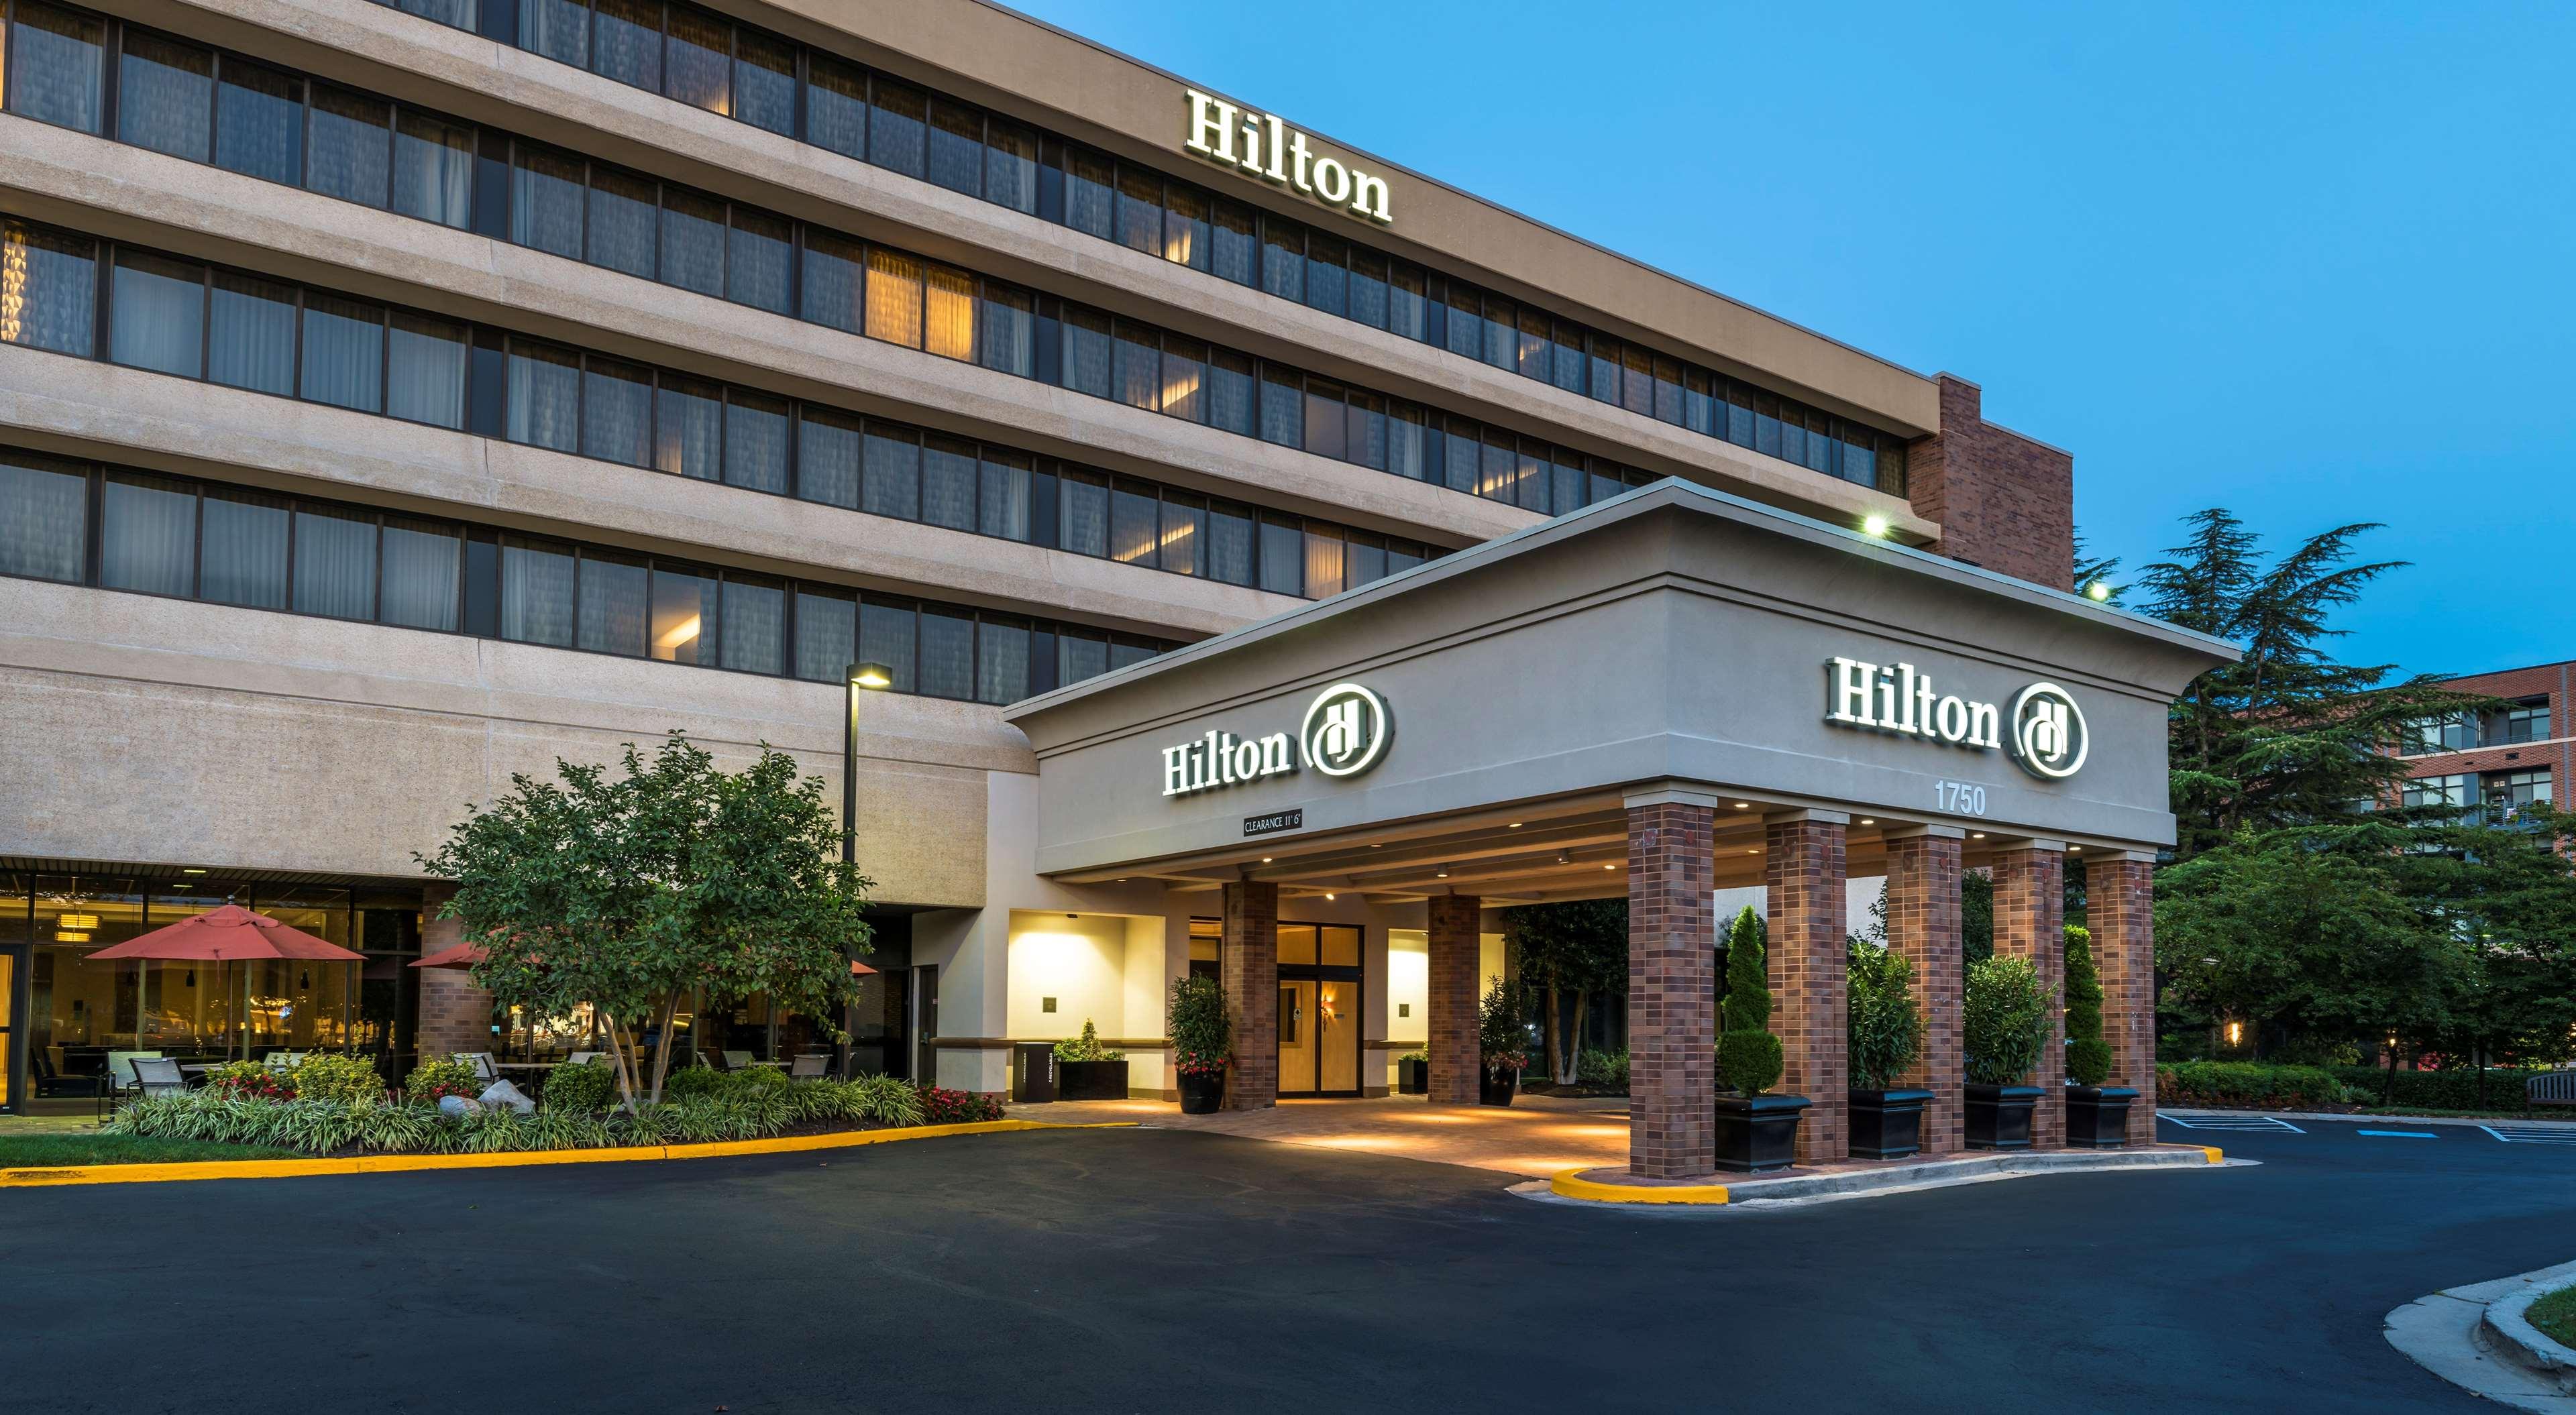 Hilton Washington DC/Rockville Hotel & Executive Meeting Ctr image 2